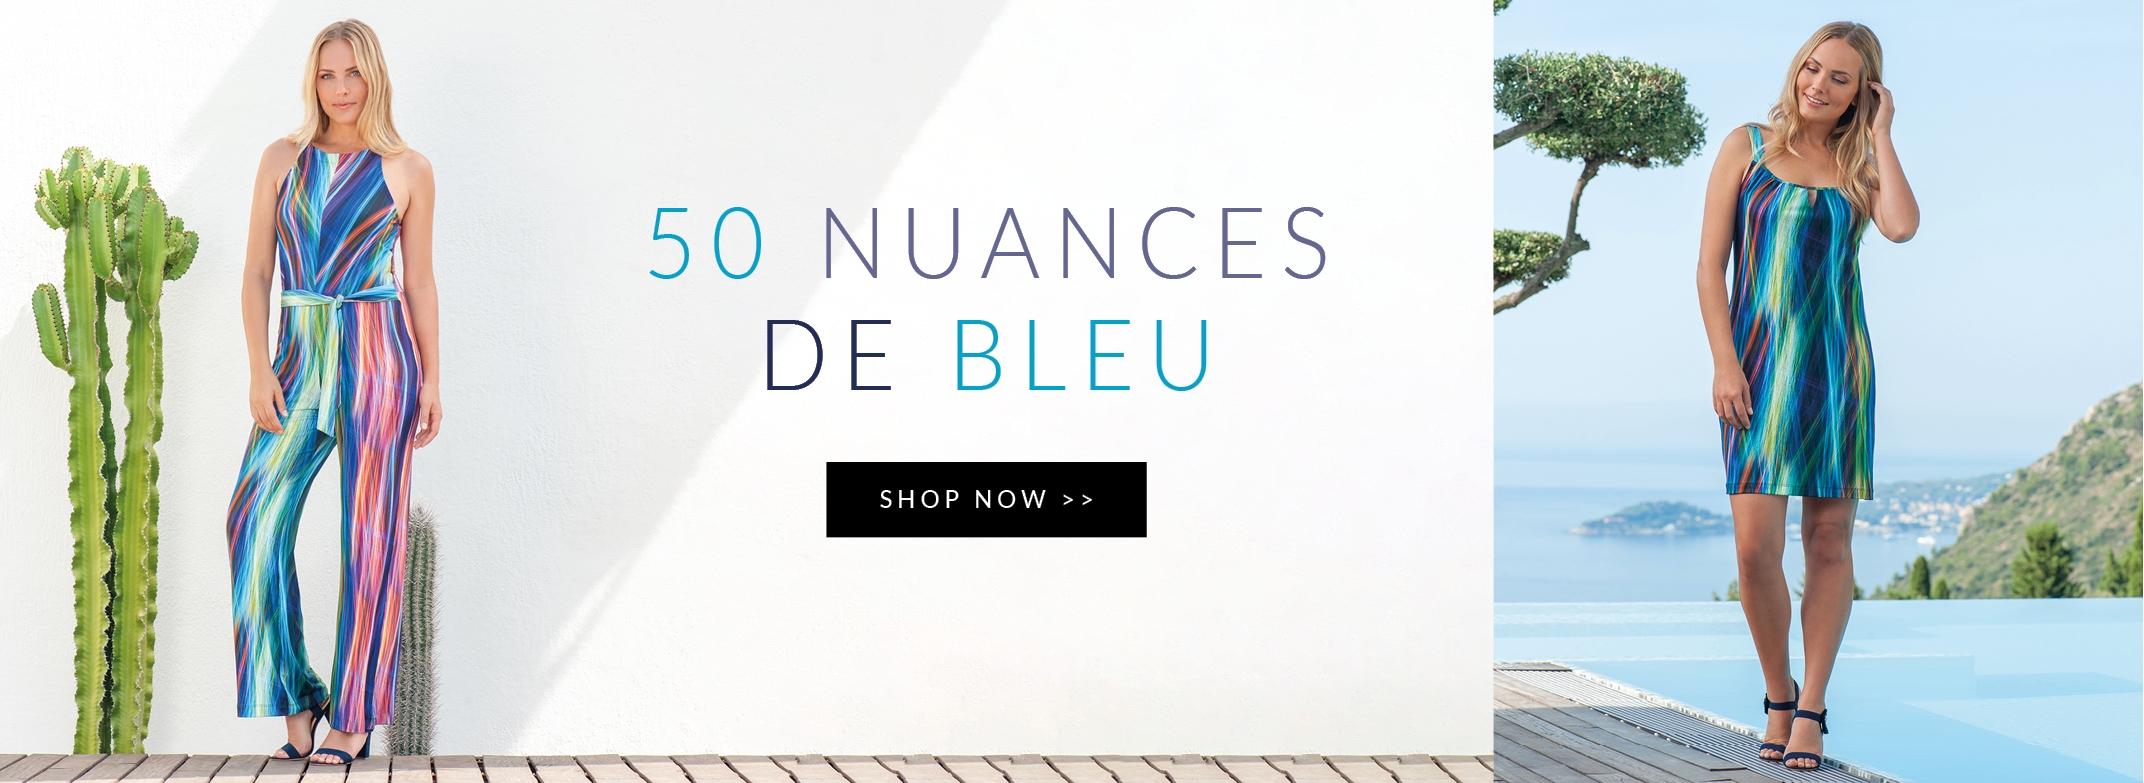 50 nuances de bleu chez BLEU D'AZUR